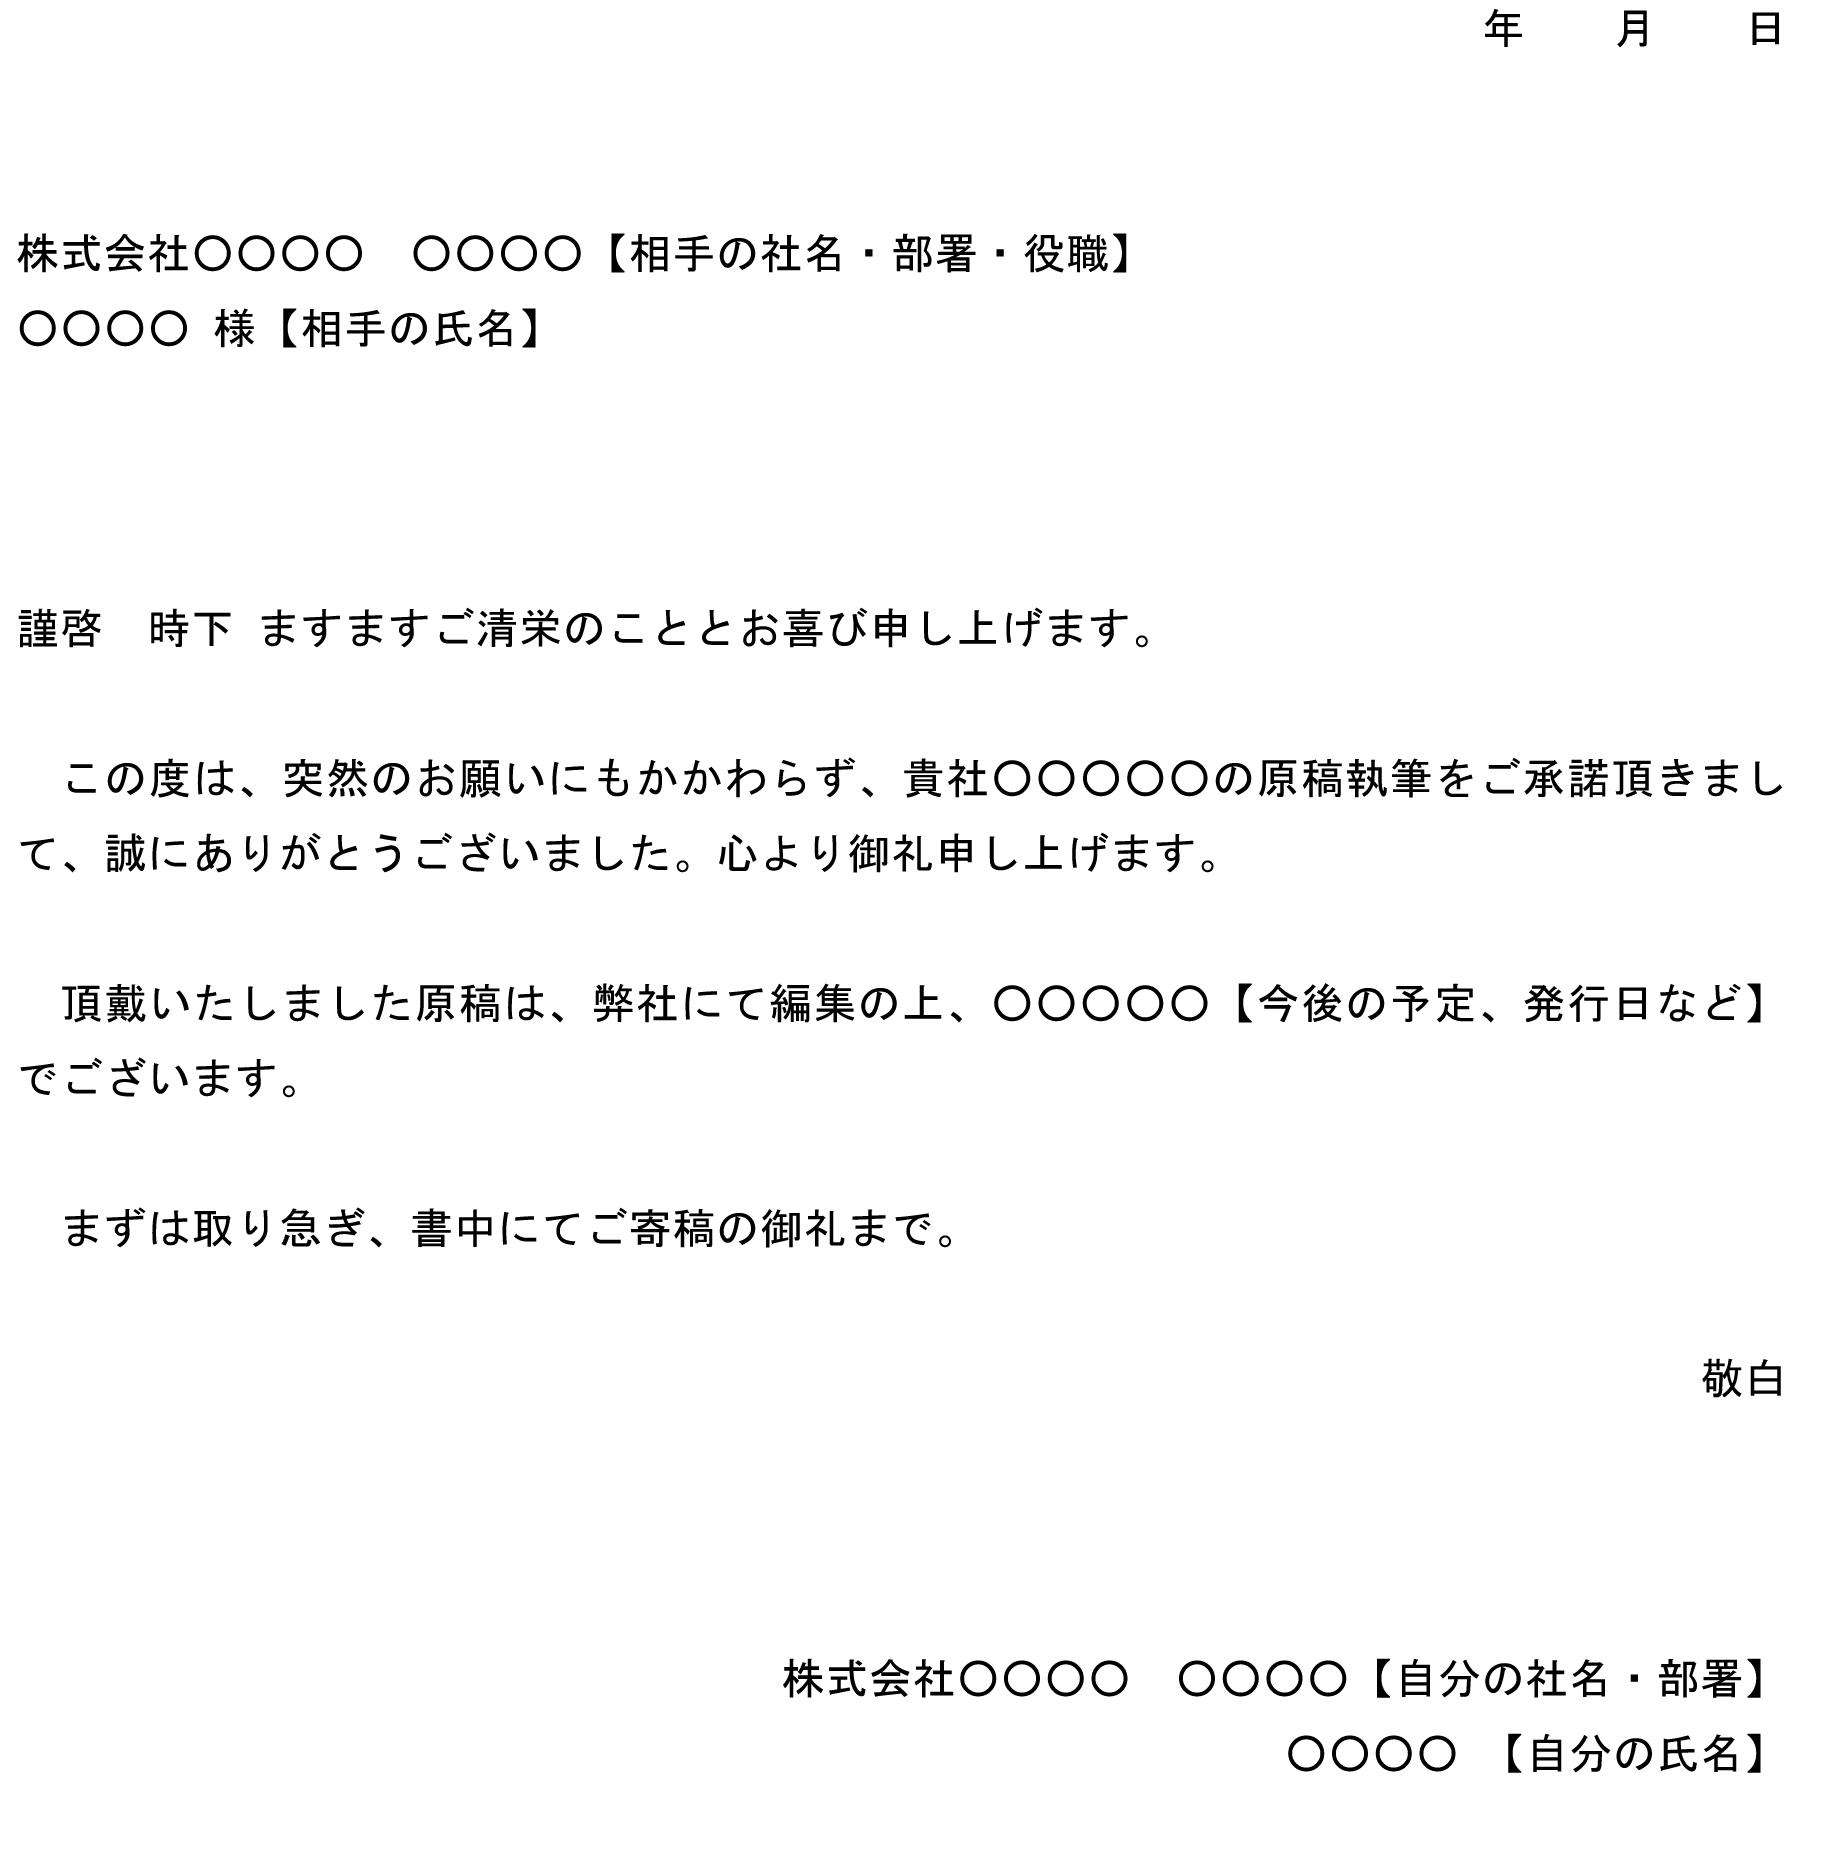 お礼状(原稿執筆)